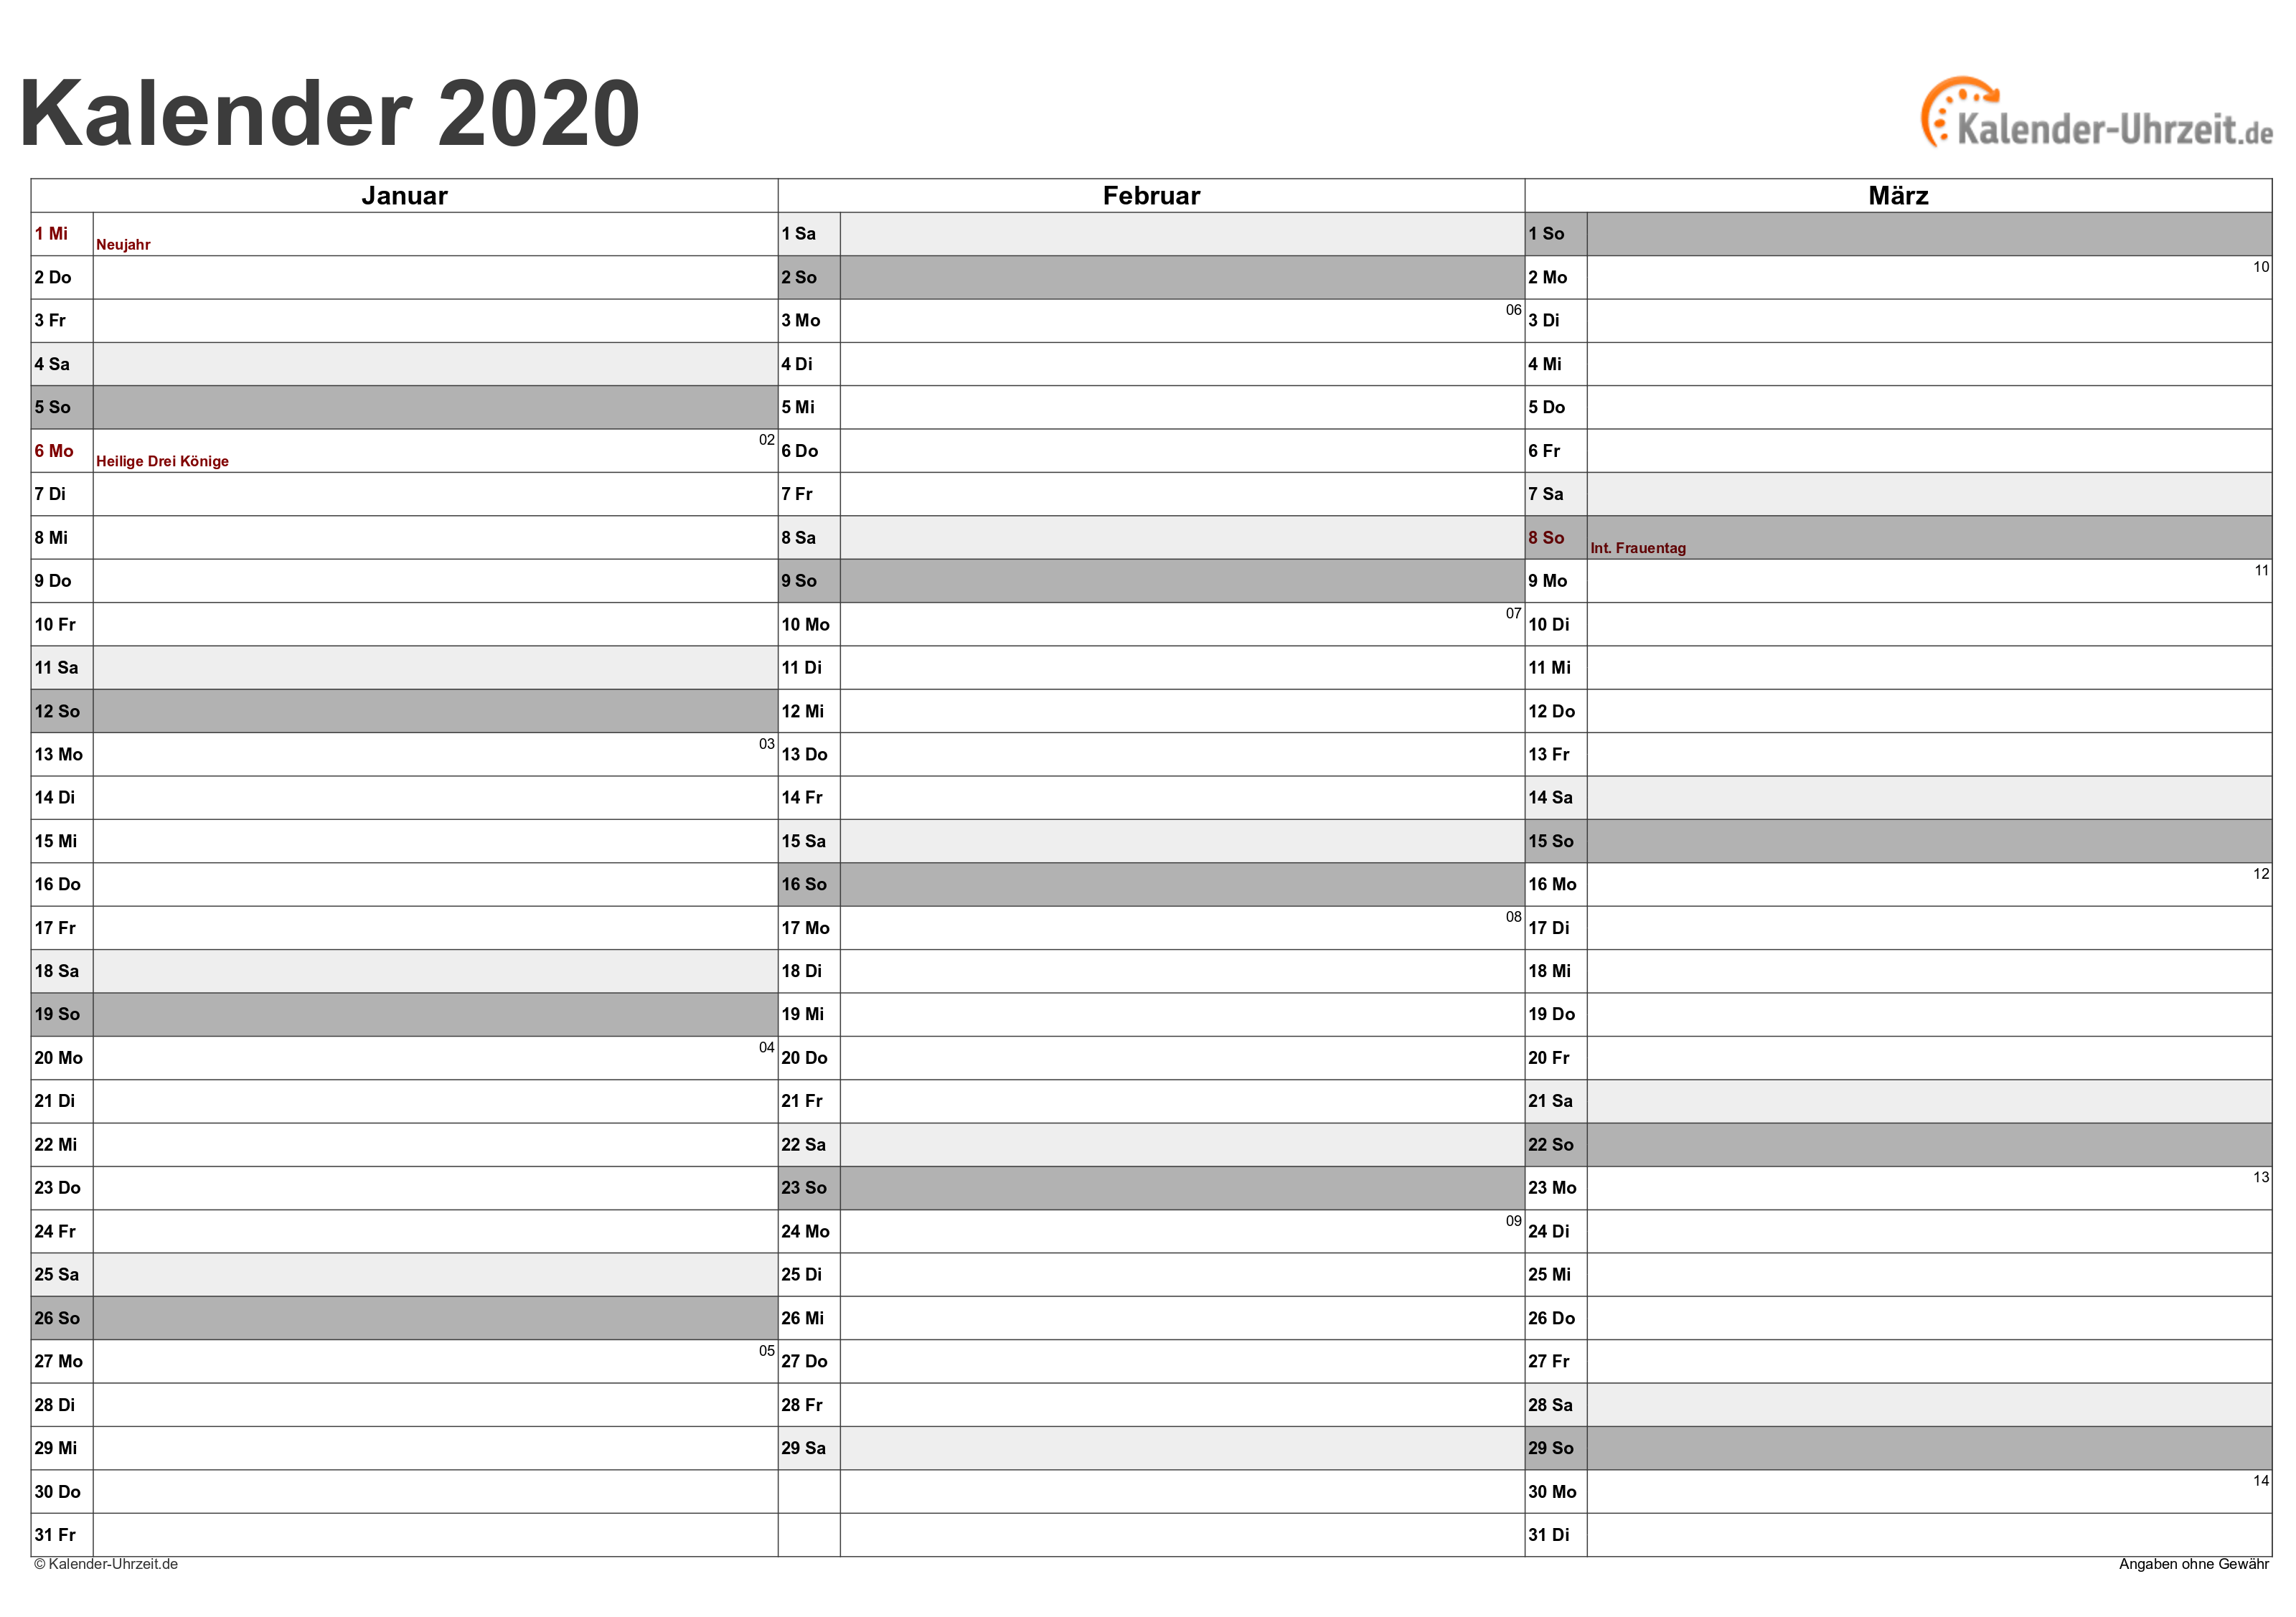 Monatskalender 2020 Schweiz Excel Pdf Kostenlos Downloaden